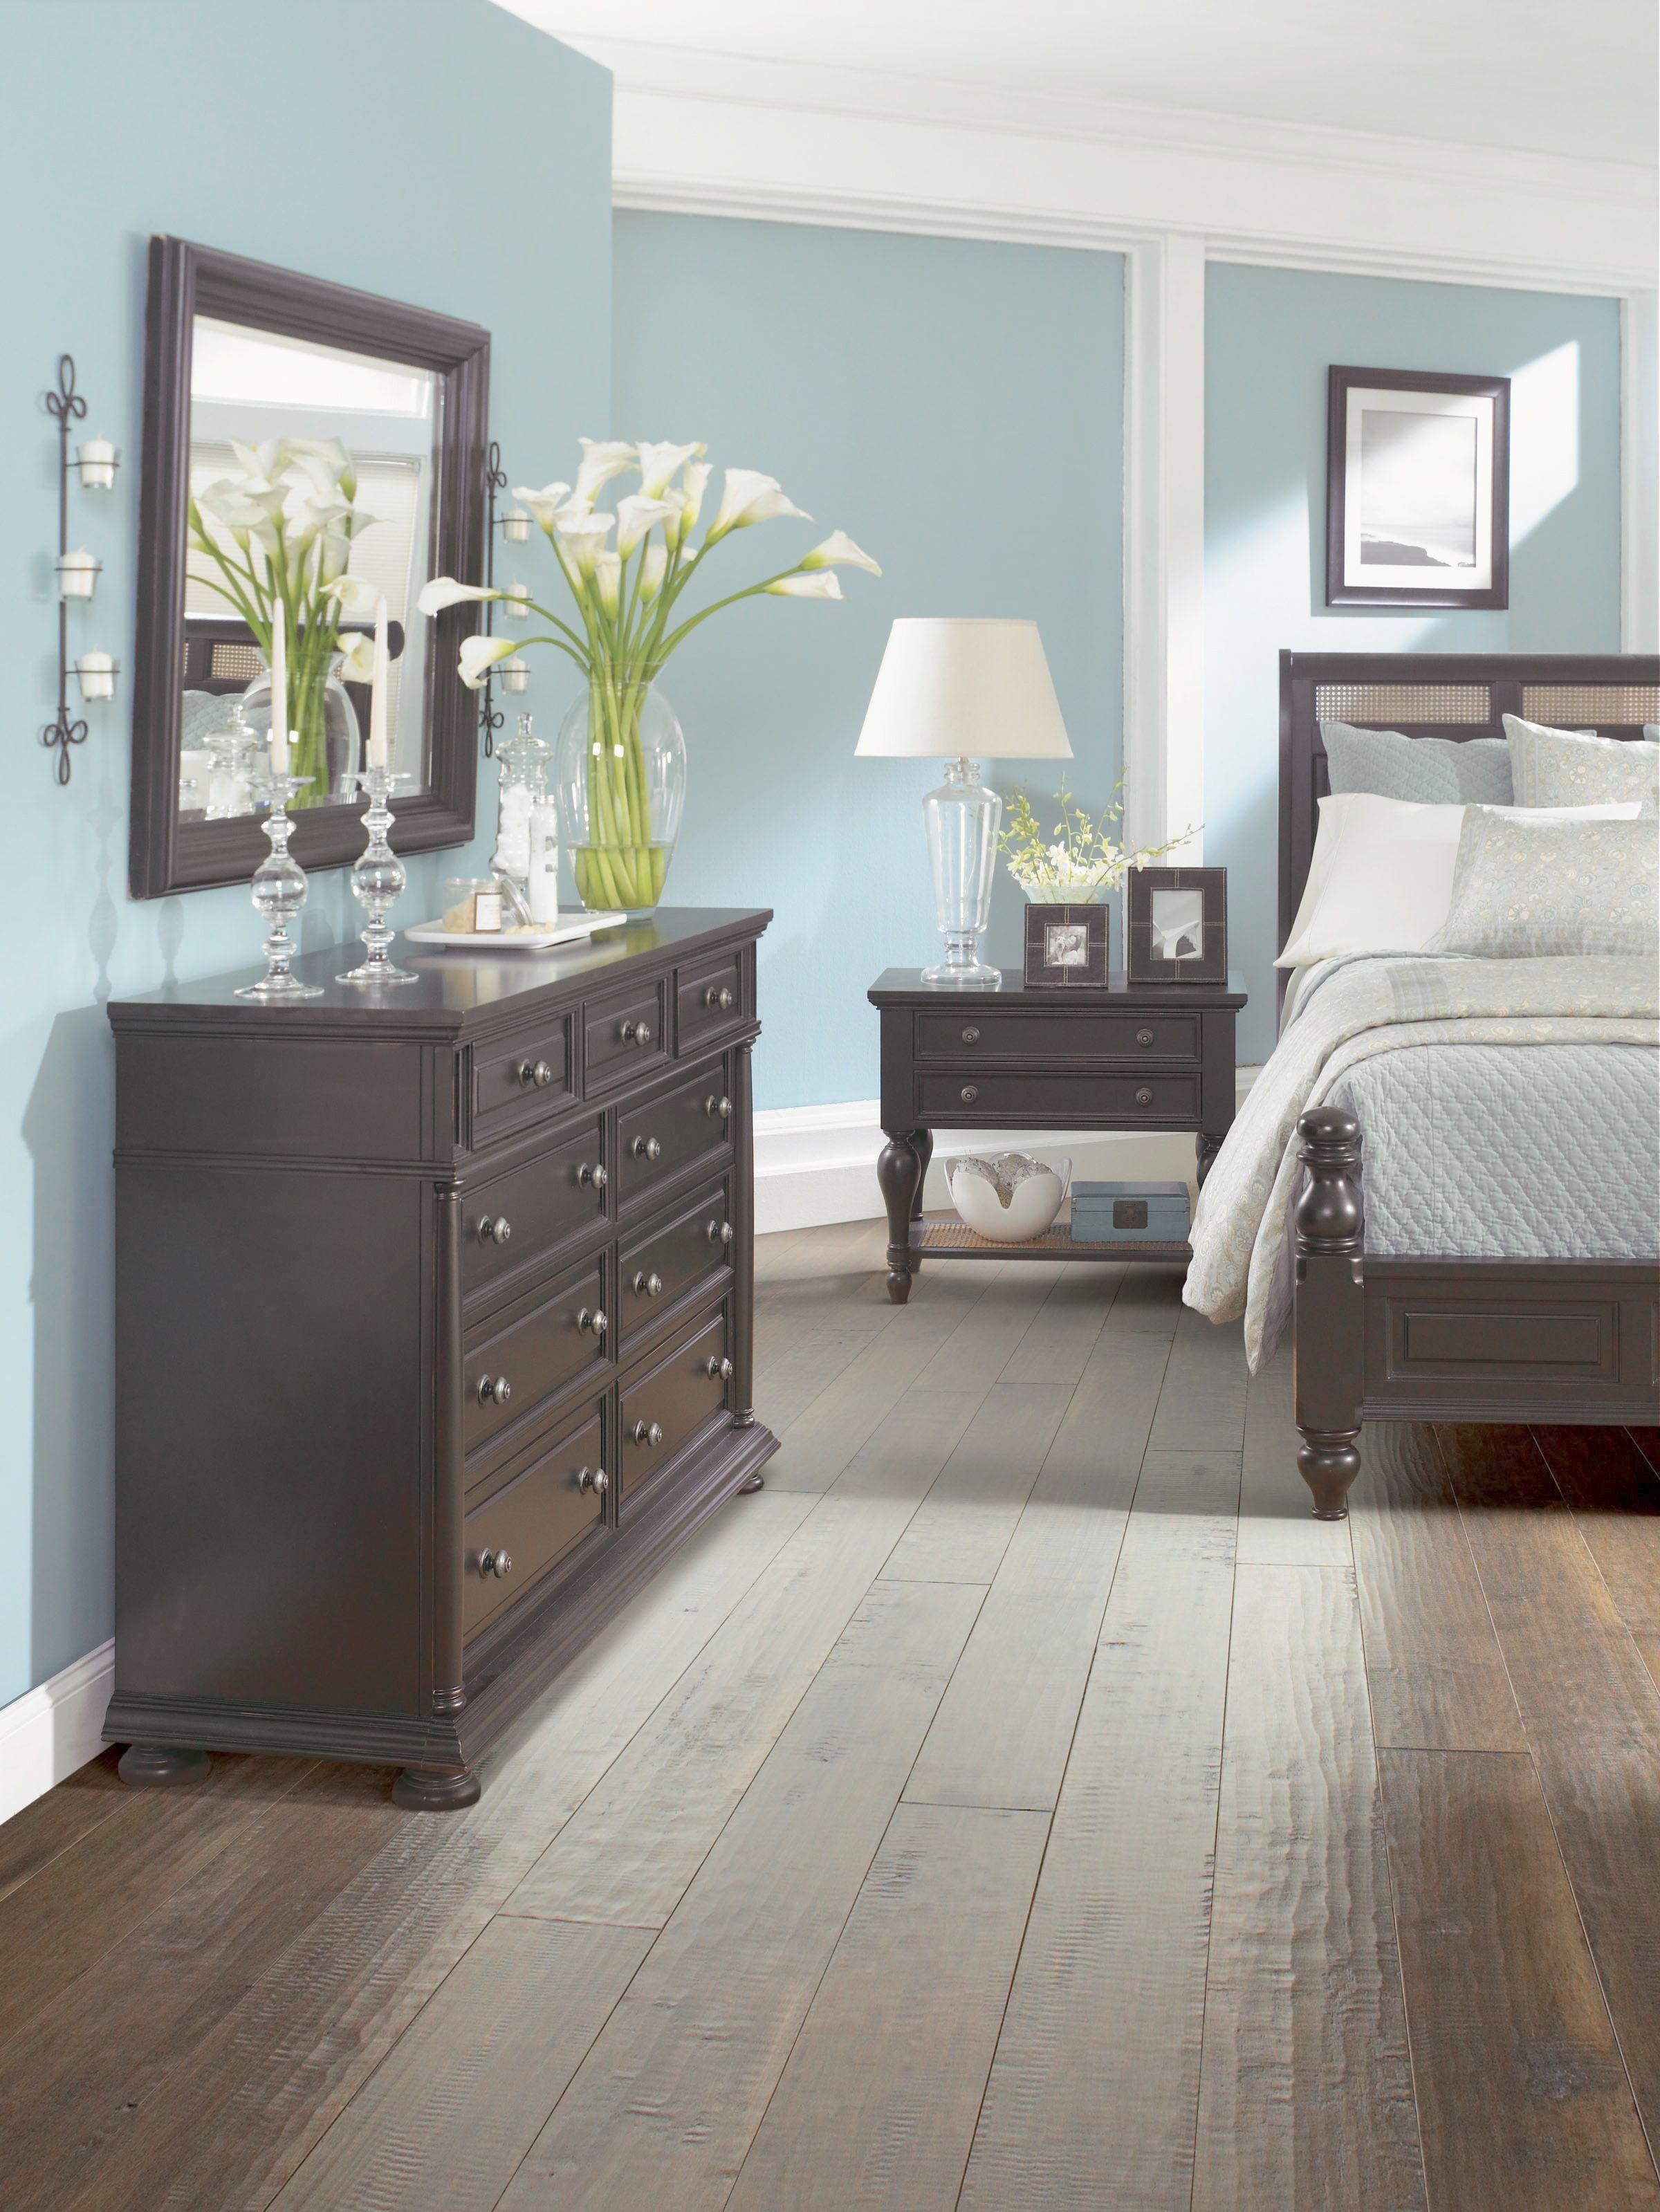 Zinus Upholstered Button Tufted Premium Platform Bed ...